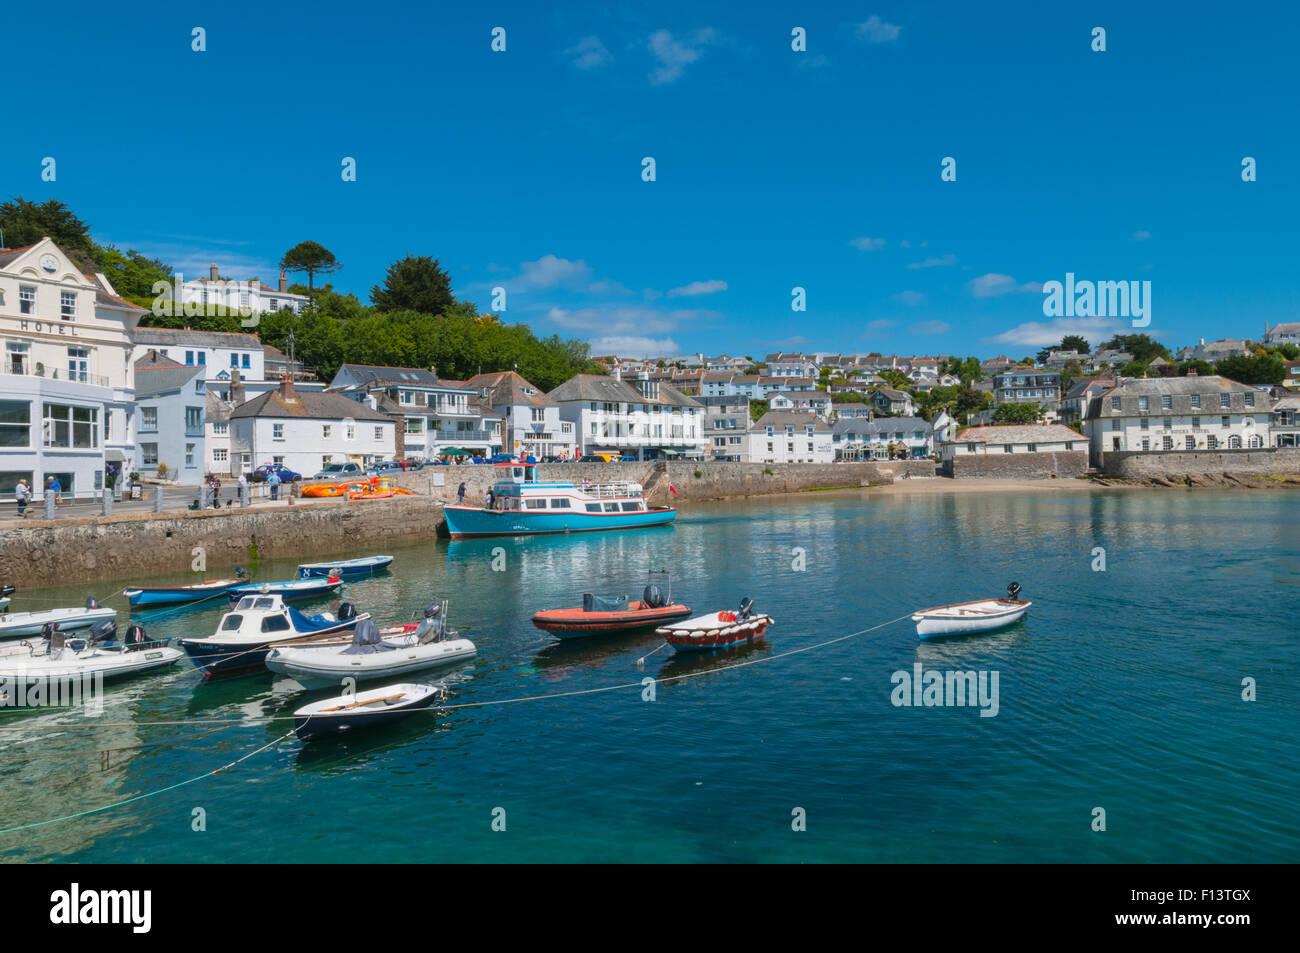 Bateaux dans le port de St Mawes St Mawes Cornwall Angleterre Photo Stock